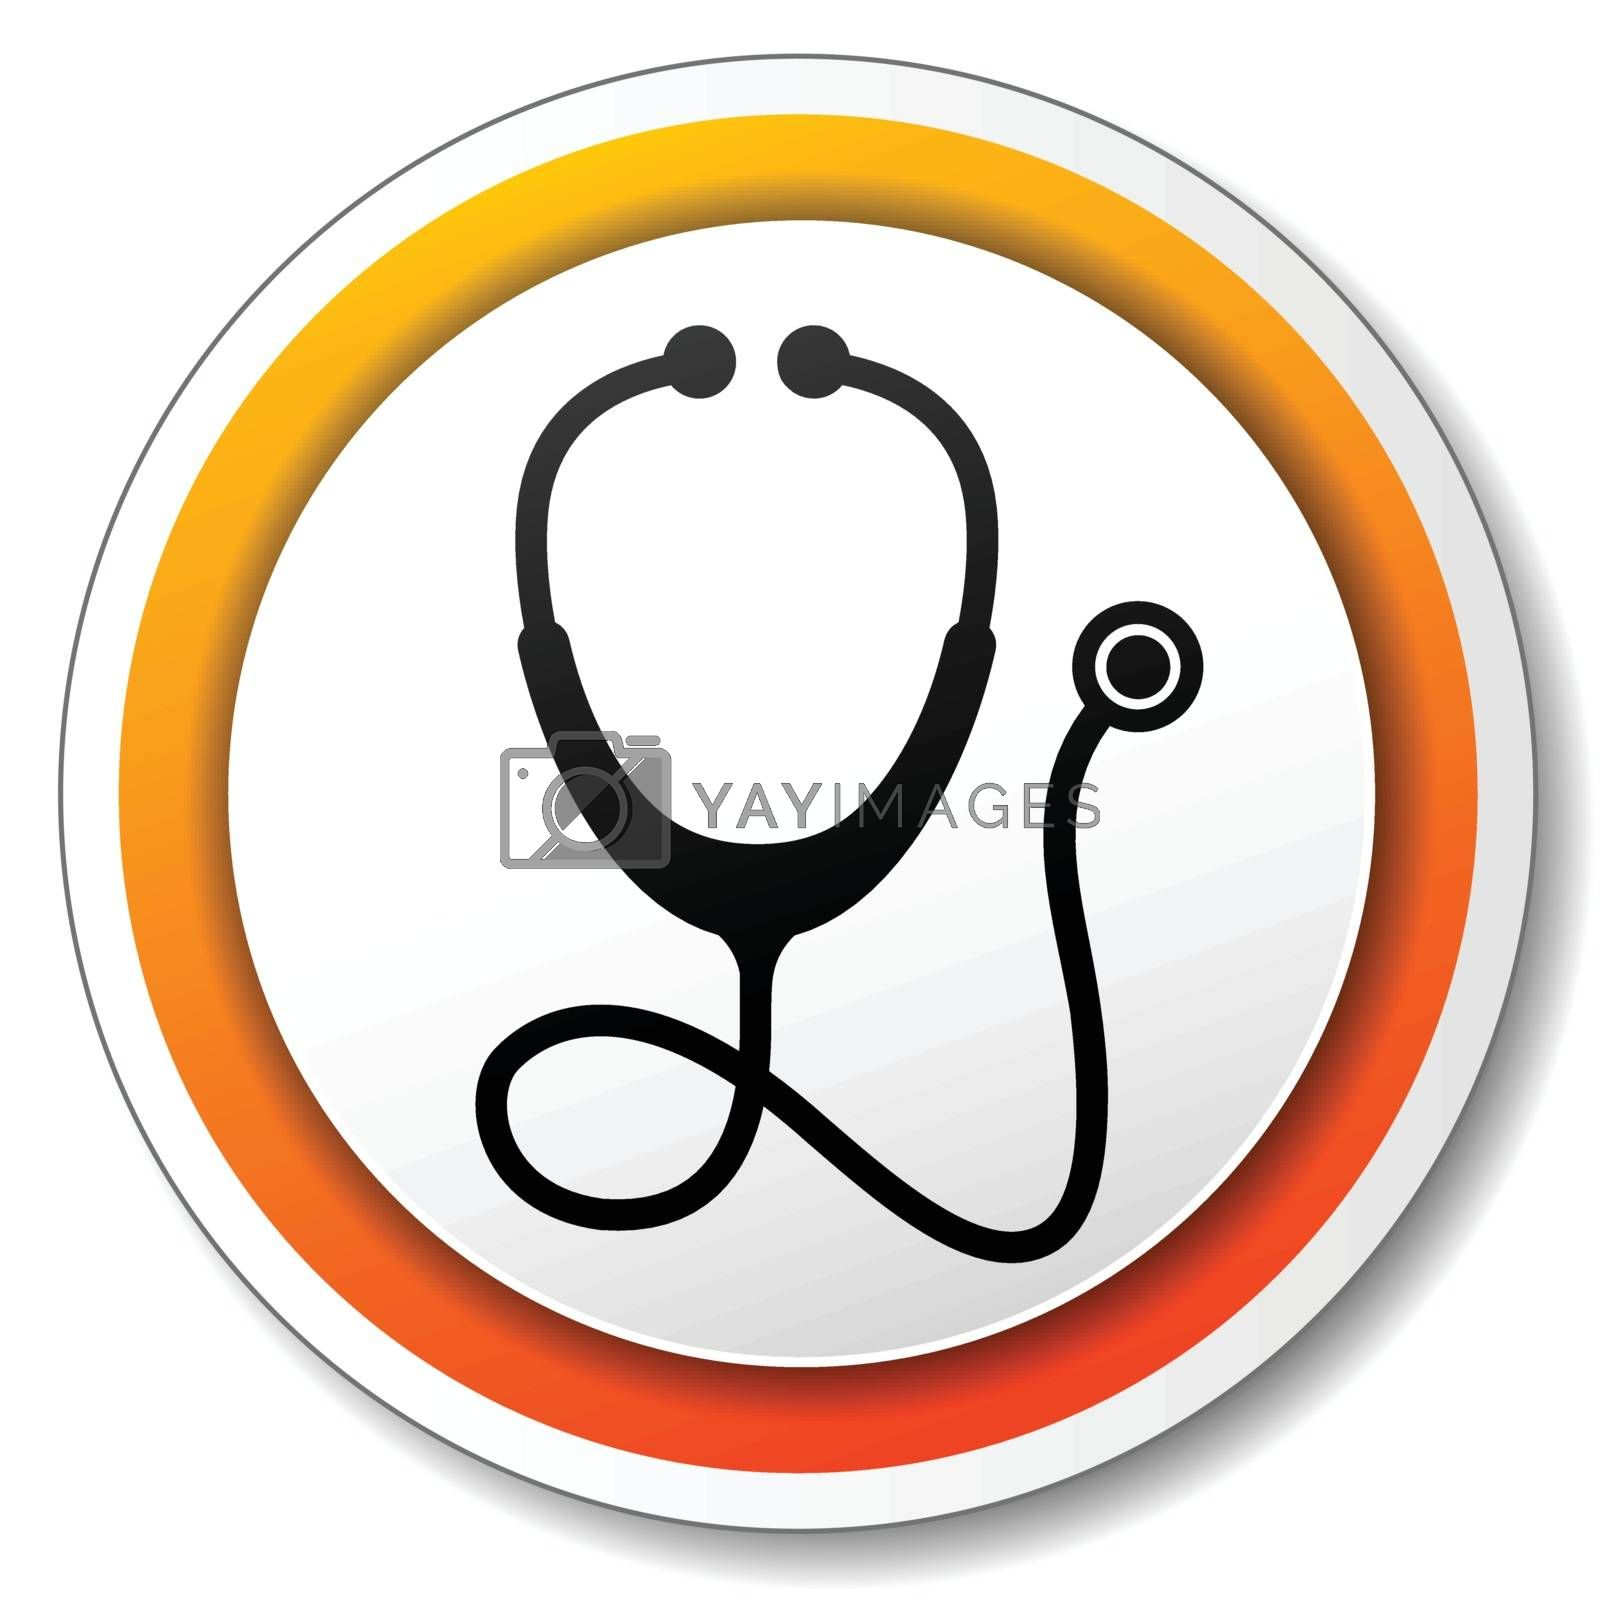 illustration of orange and white icon for stethoscope